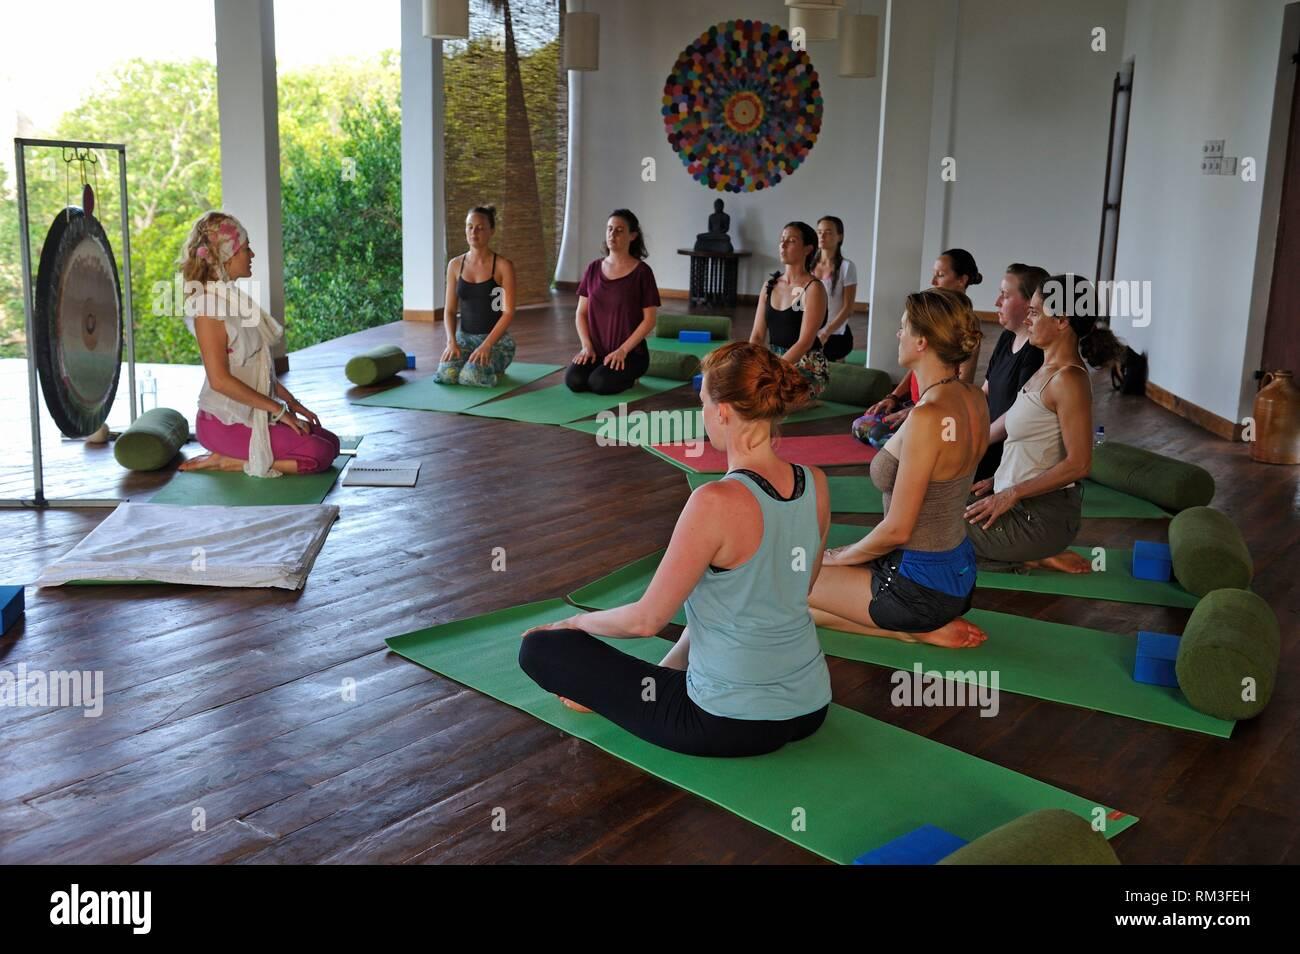 yoga class at the Sen Wellness Sanctuary, near Tangalle, South Coast of Sri Lanka, Indian subcontinent, South Asia. Stock Photo